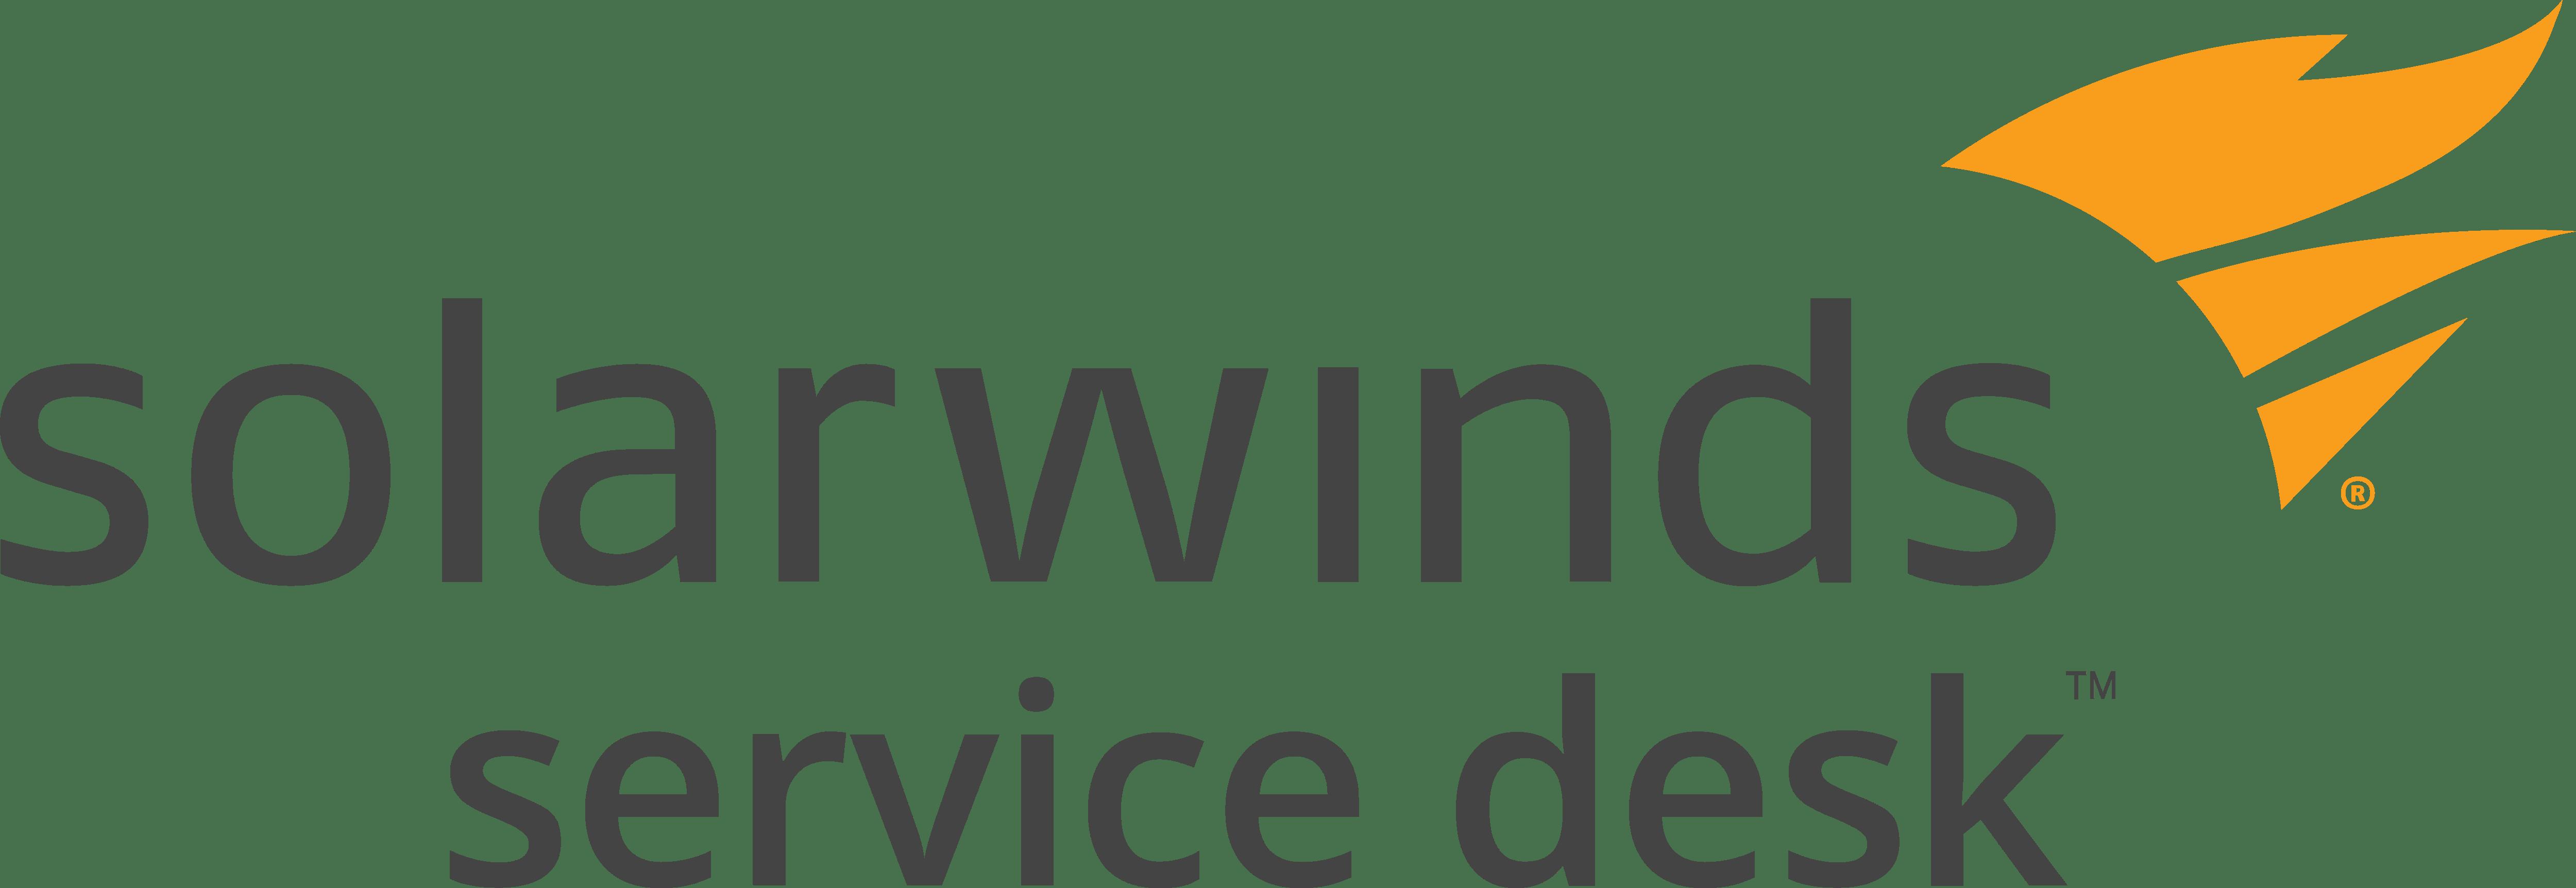 SolarWinds Service Desk logo